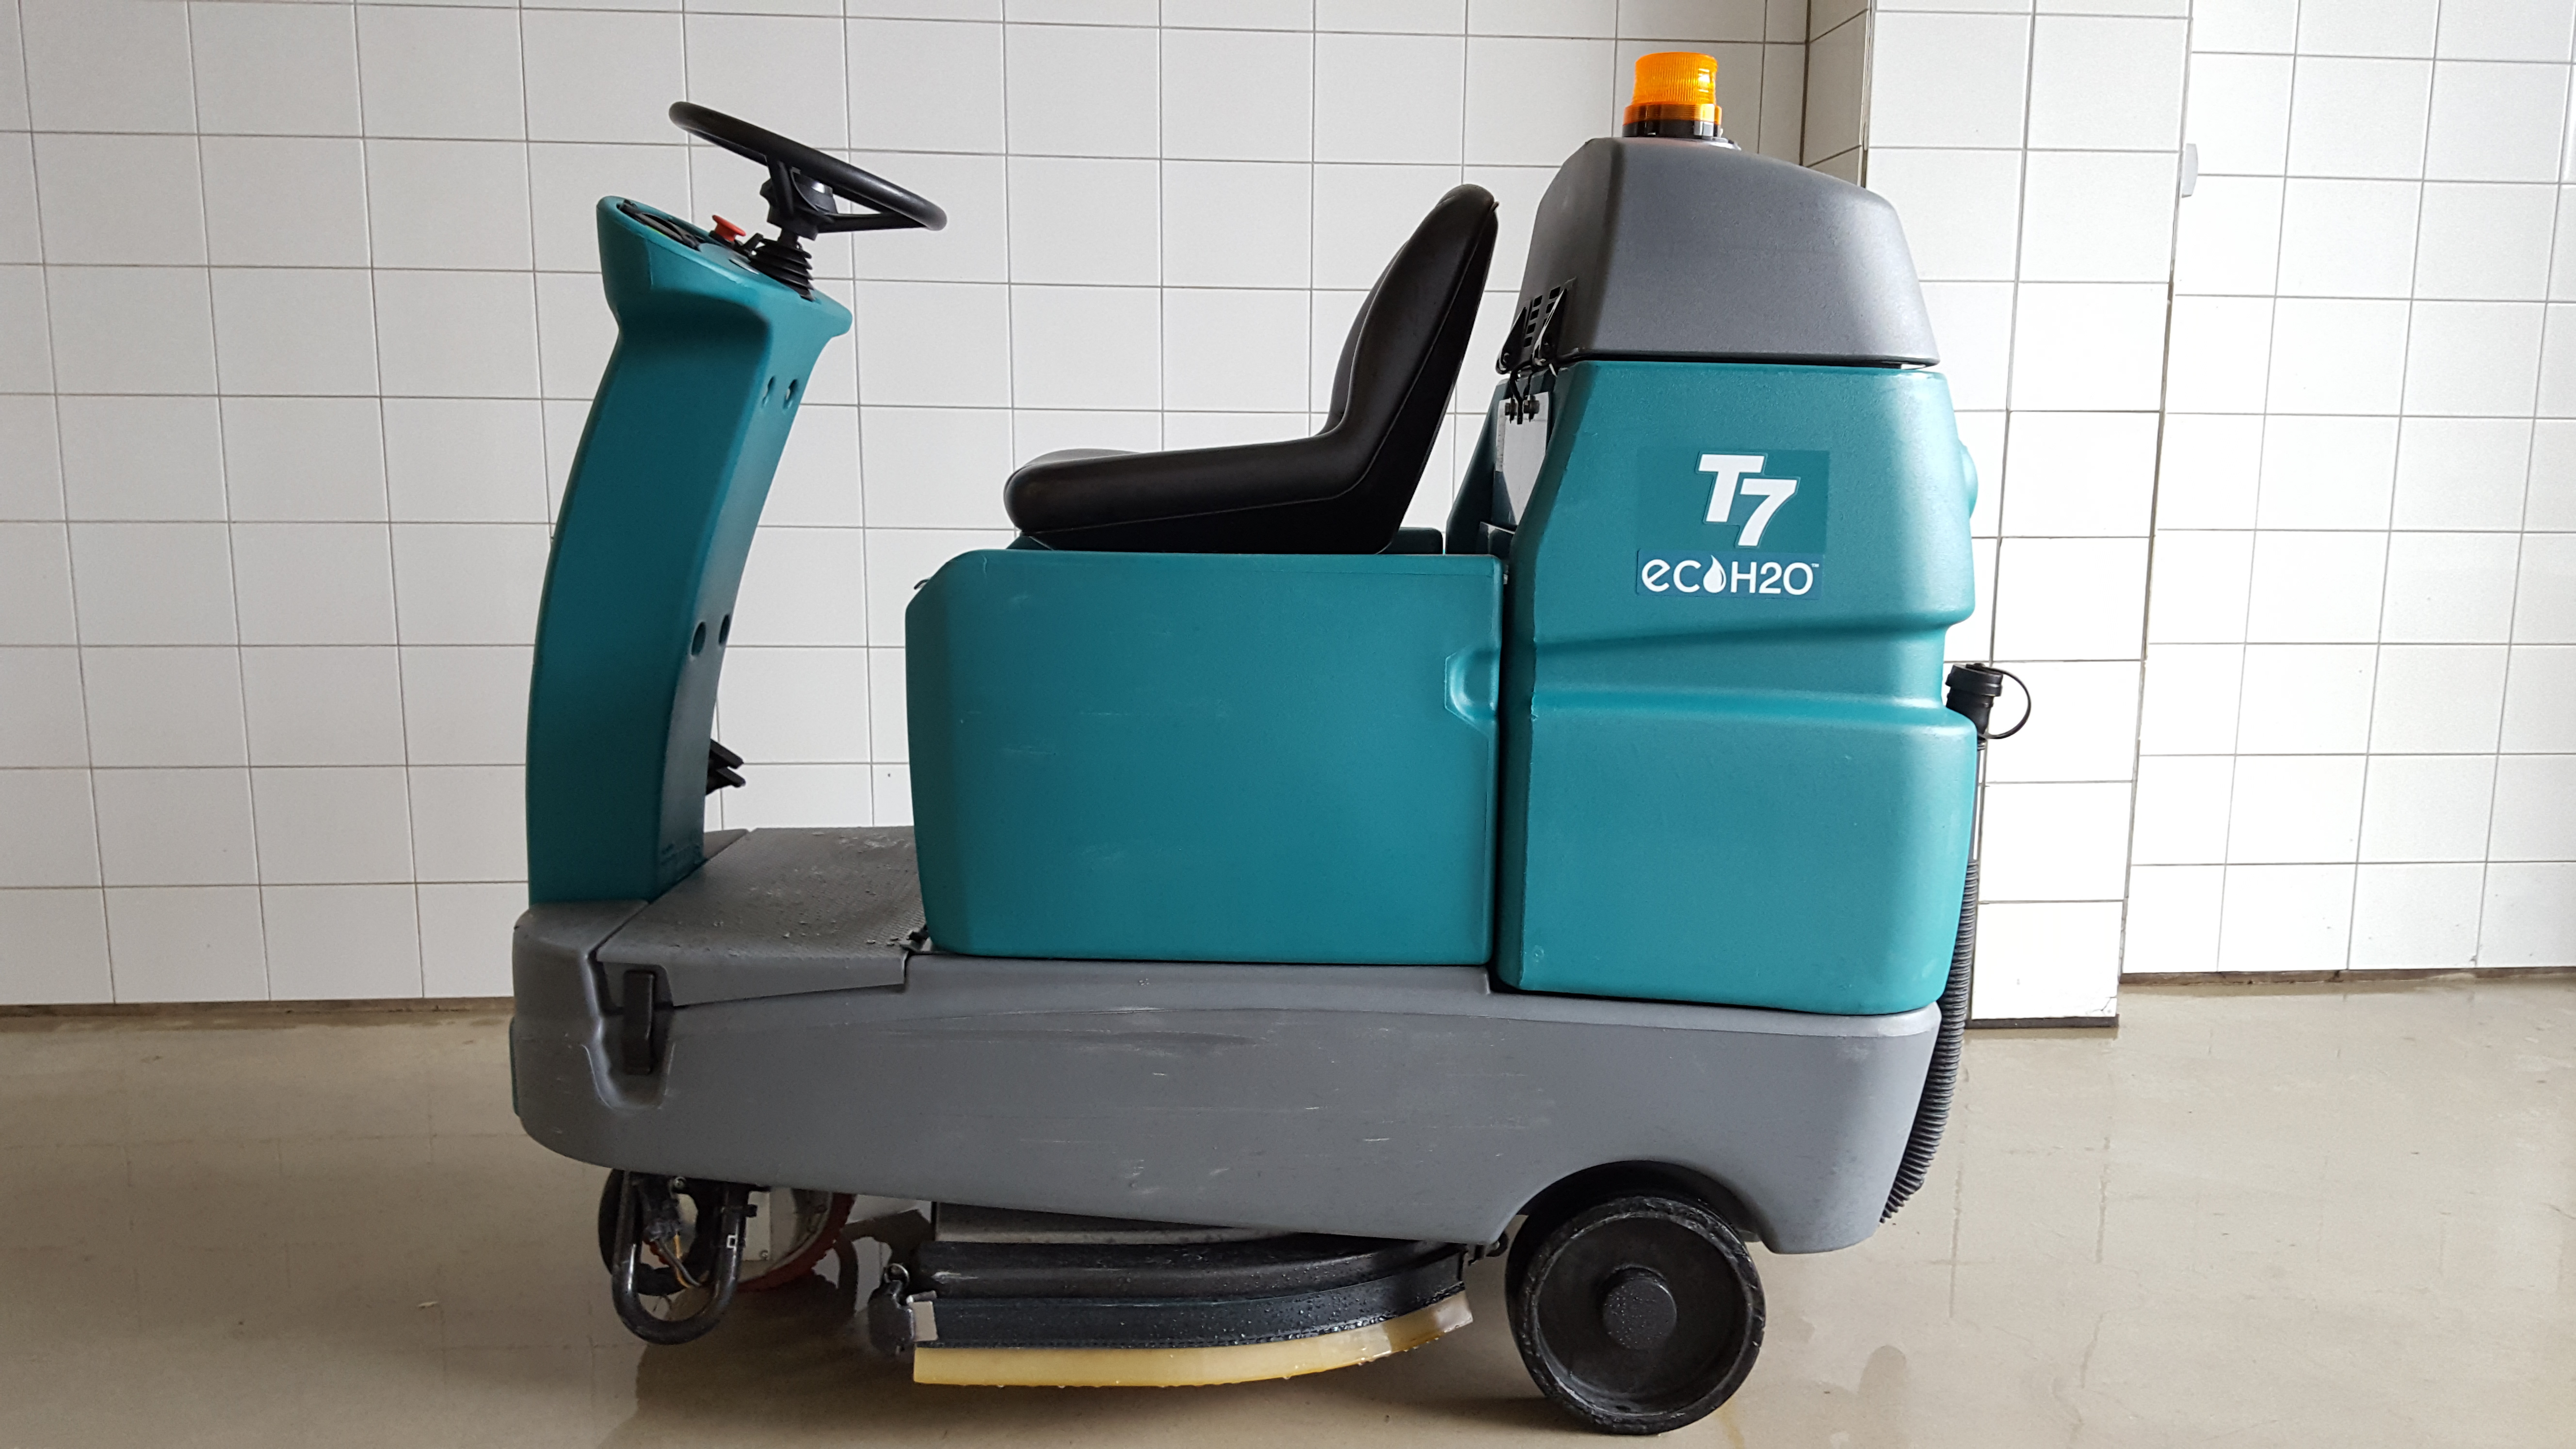 Tennant T7 Micro Rider Floor Scrubber Exapro